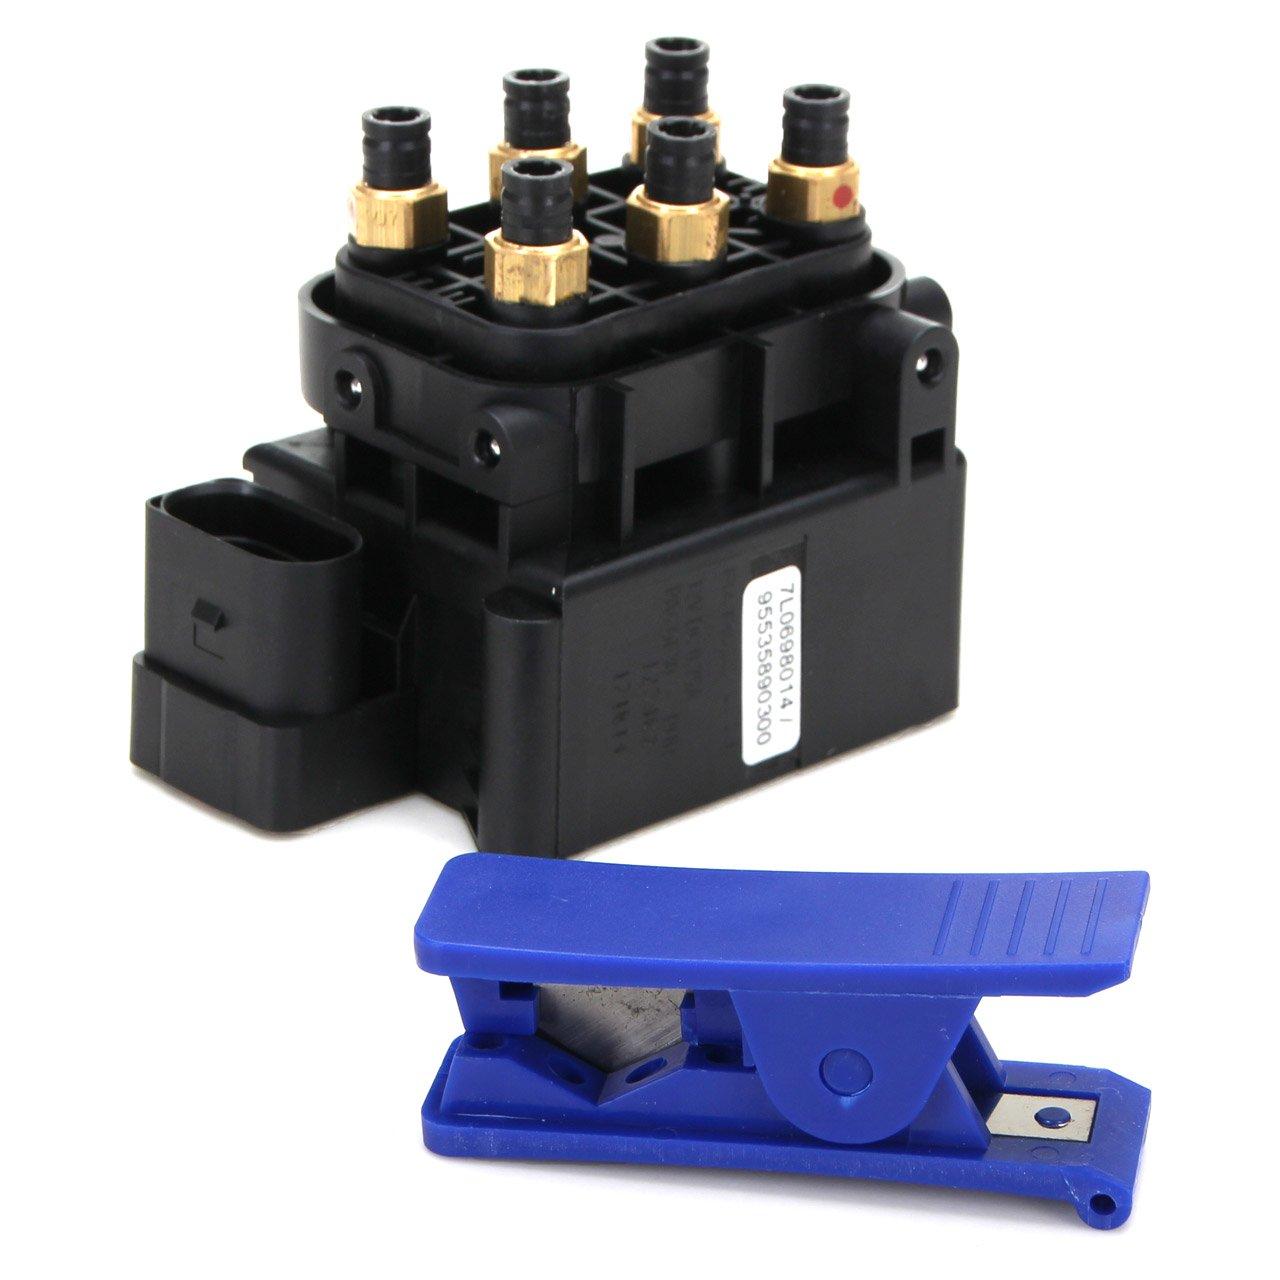 RAPA Ventil Druckluftanlage Luftfederung AUDI Q7 (4LB) VW Touareg (7L) 7L0698014